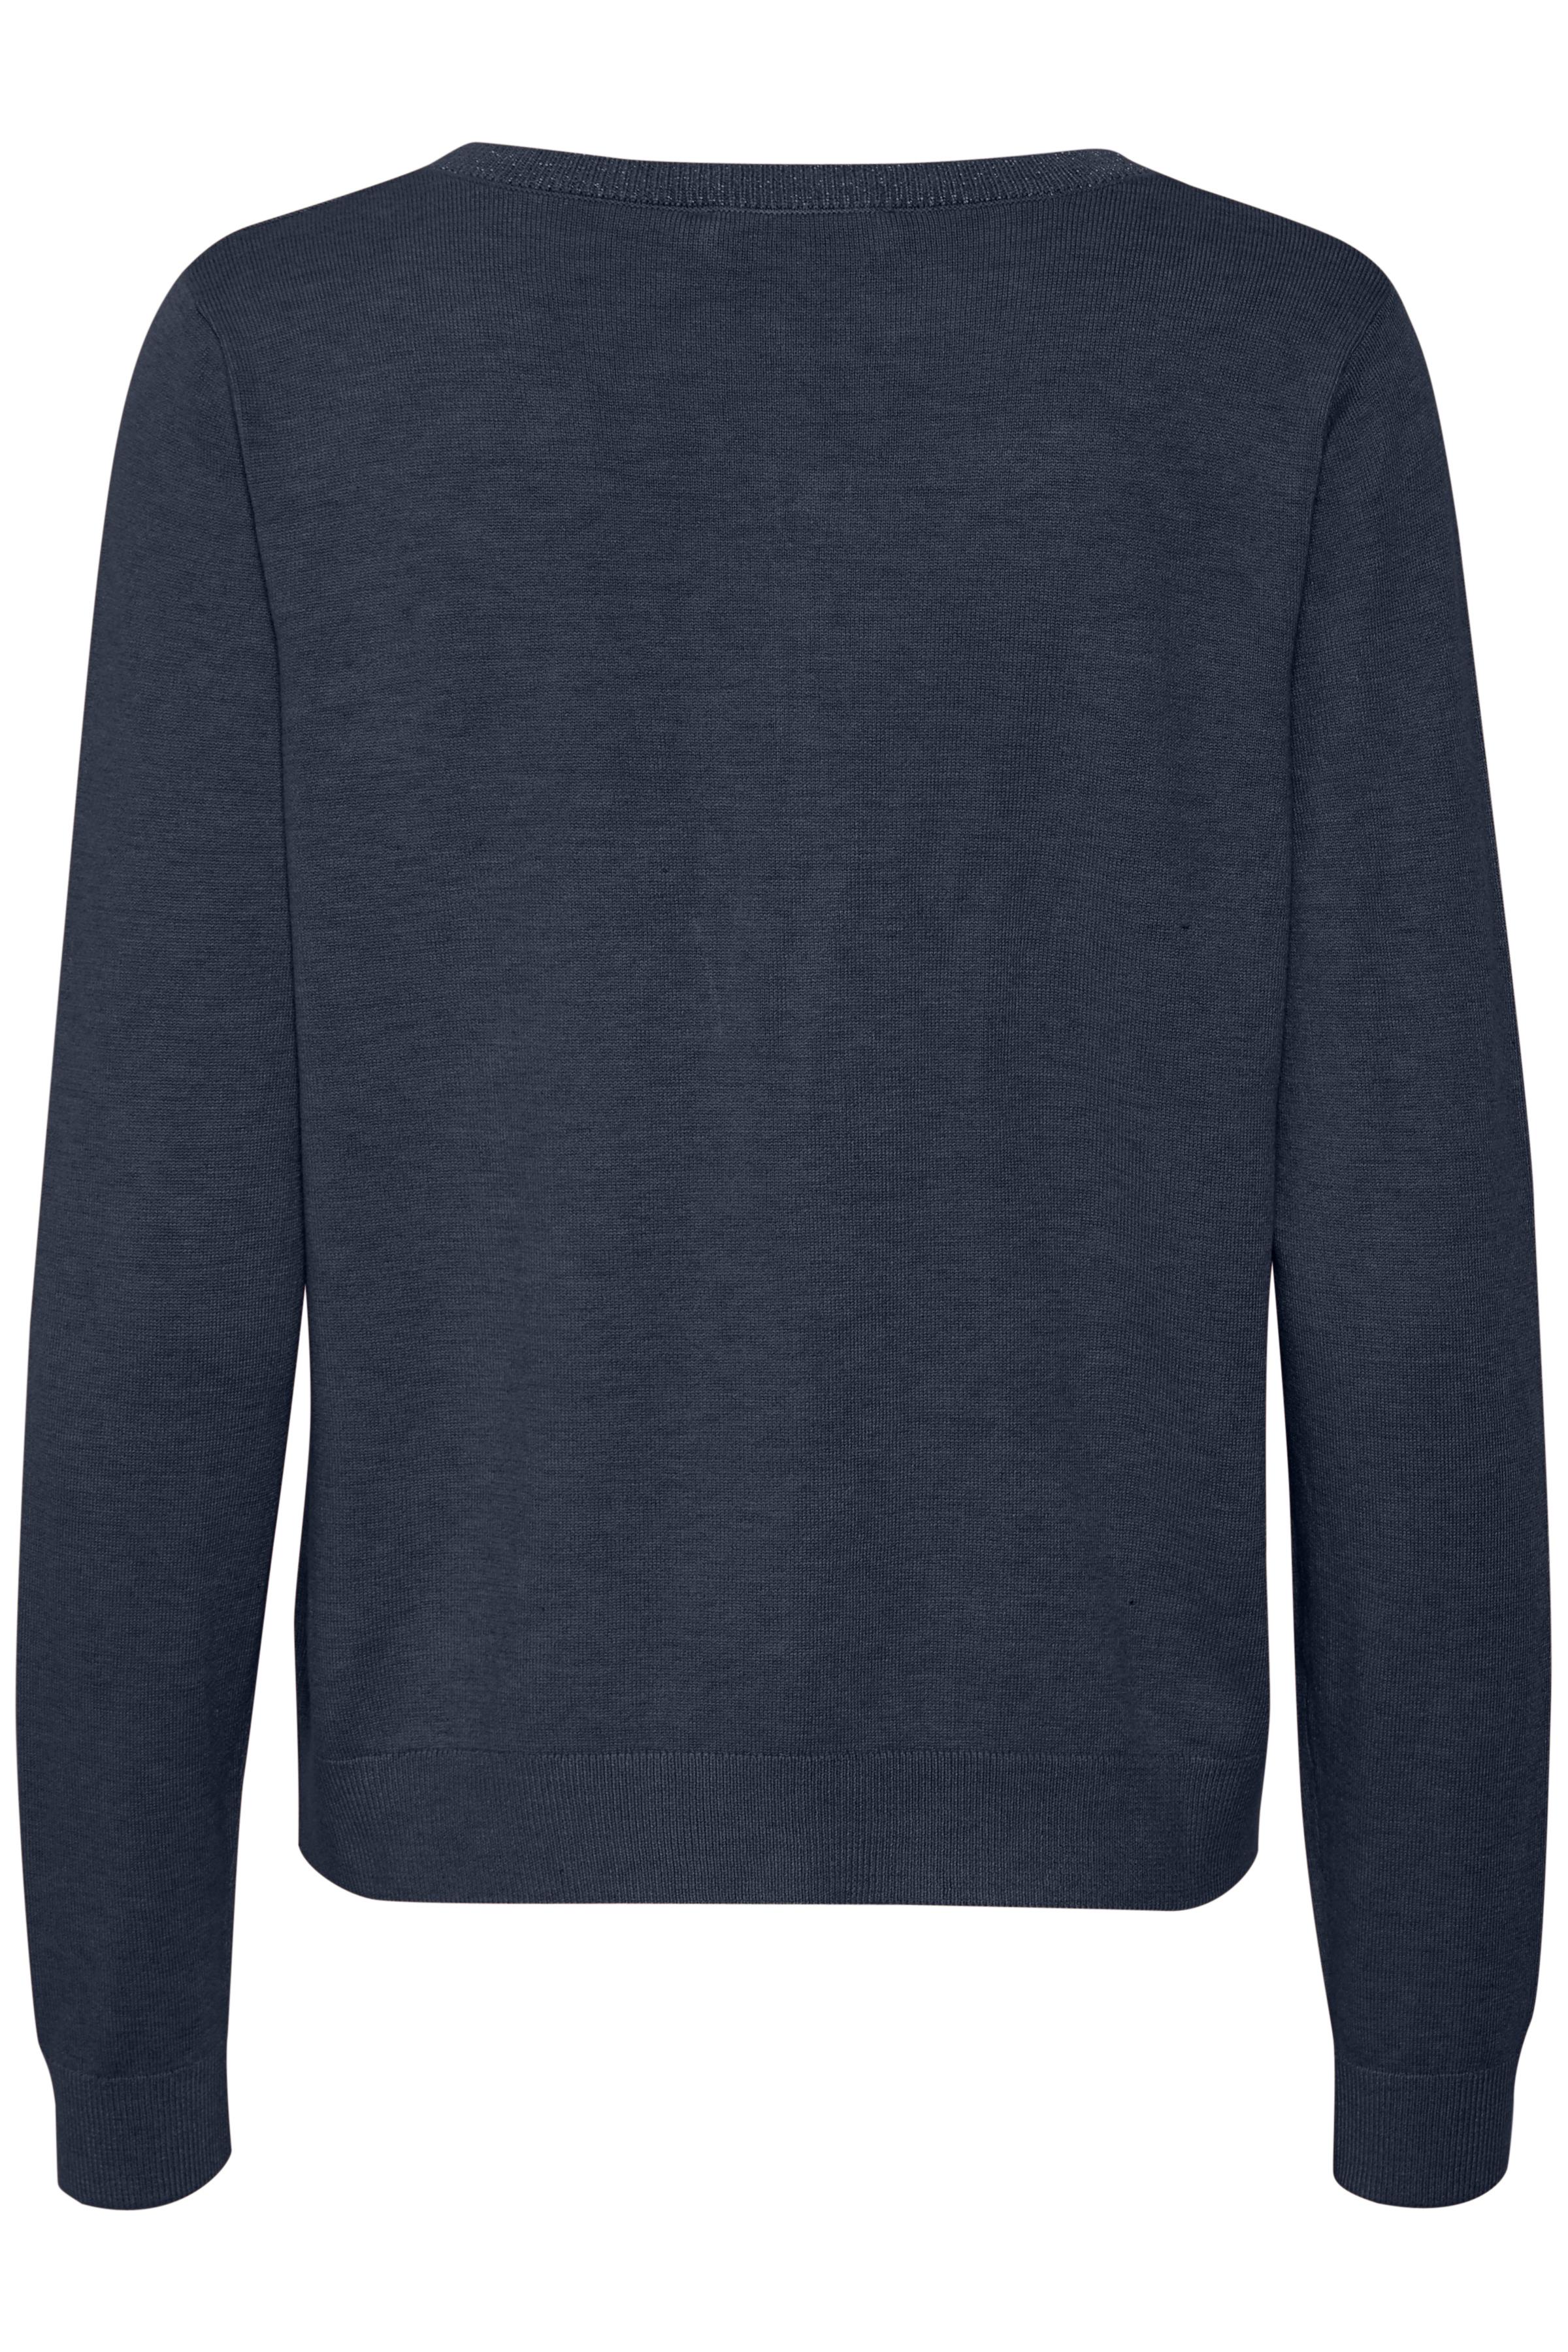 Marineblau Strick-Cardigan von Cream – Shoppen Sie Marineblau Strick-Cardigan ab Gr. XS-XXL hier